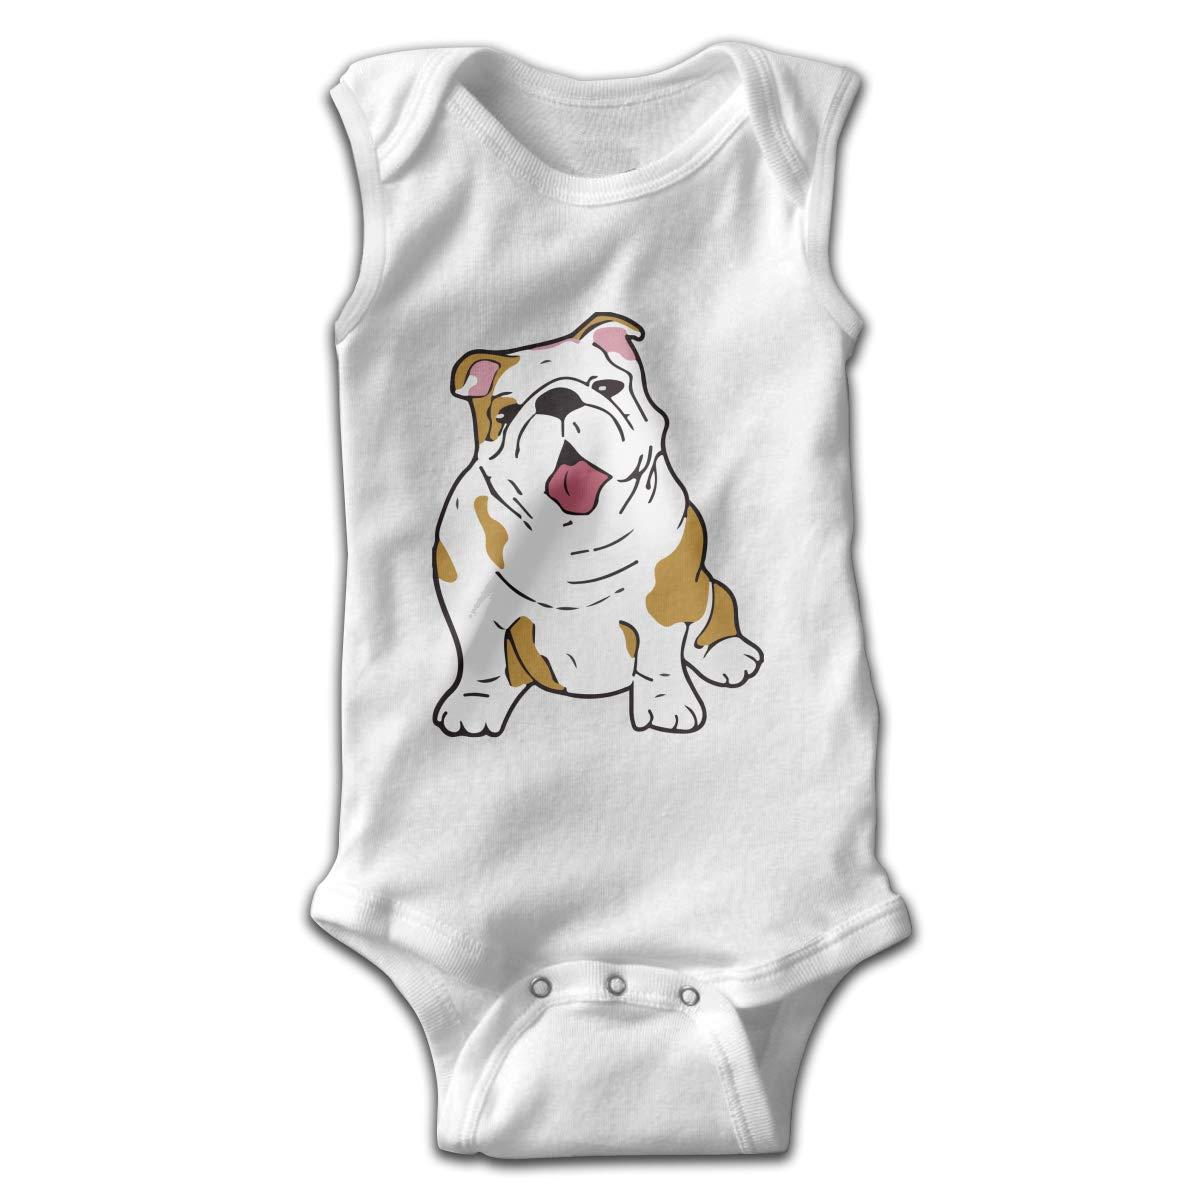 H@PAPA01 English Bulldog Newborn Sleeveless Playsuit